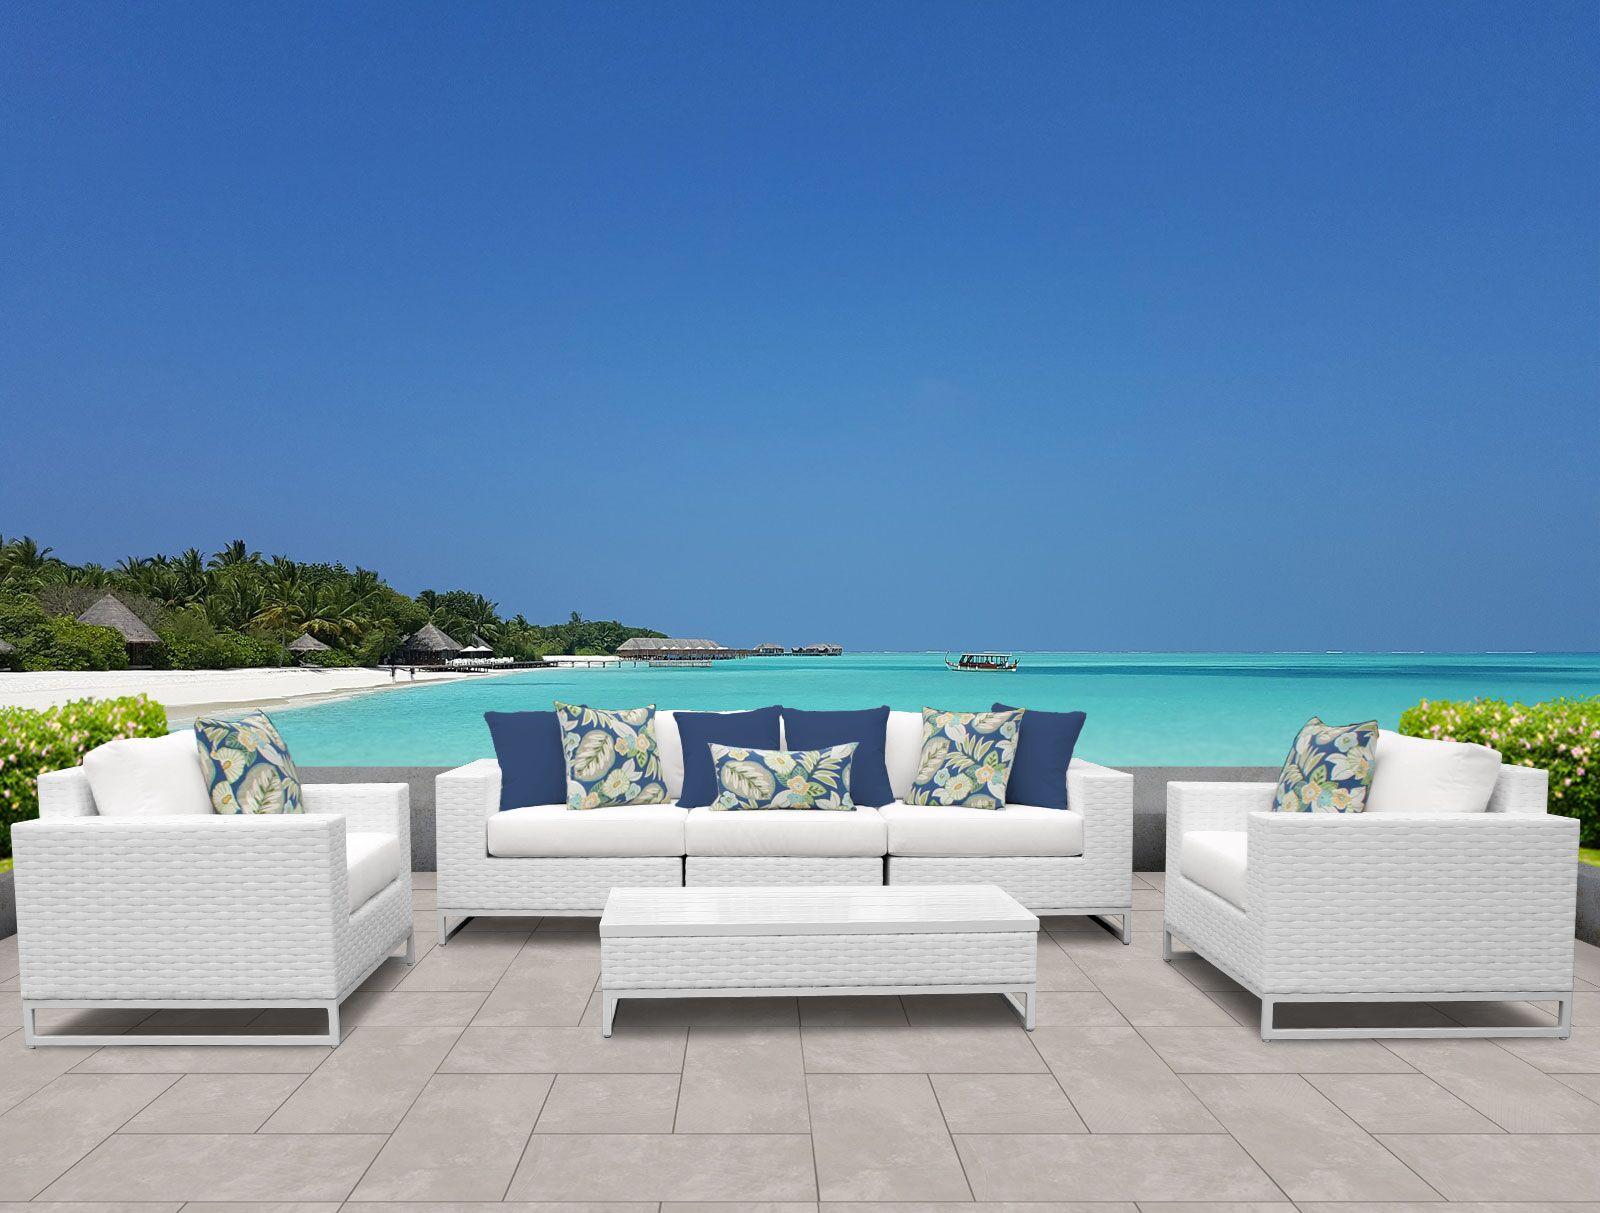 Miami 6 Piece Sofa Set with Cushions Fabric: White